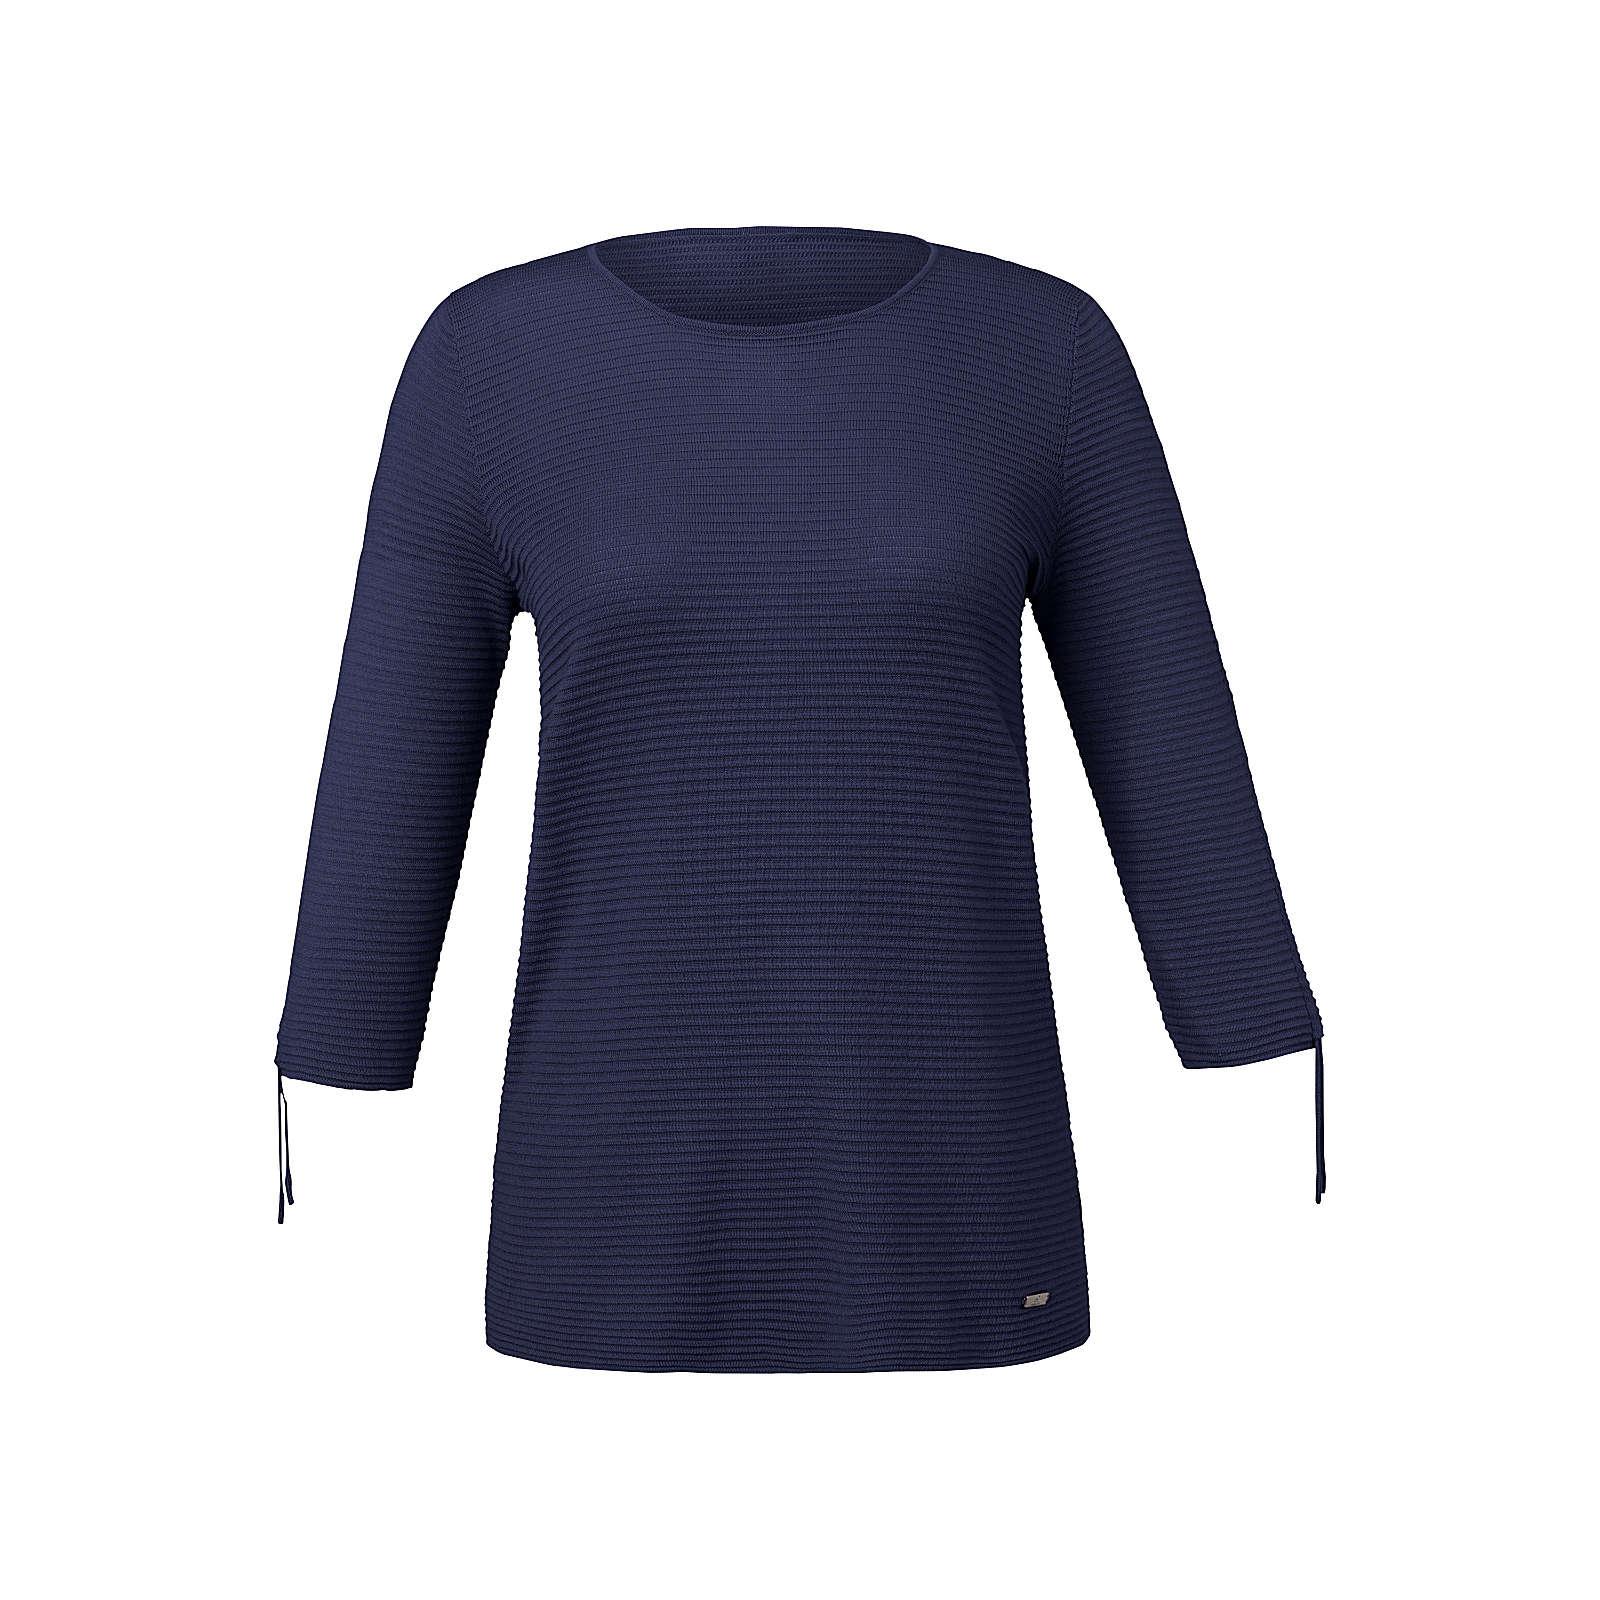 EMILIA LAY Pullover Pullover mit 3/4-Arm Pullover blau Damen Gr. 52